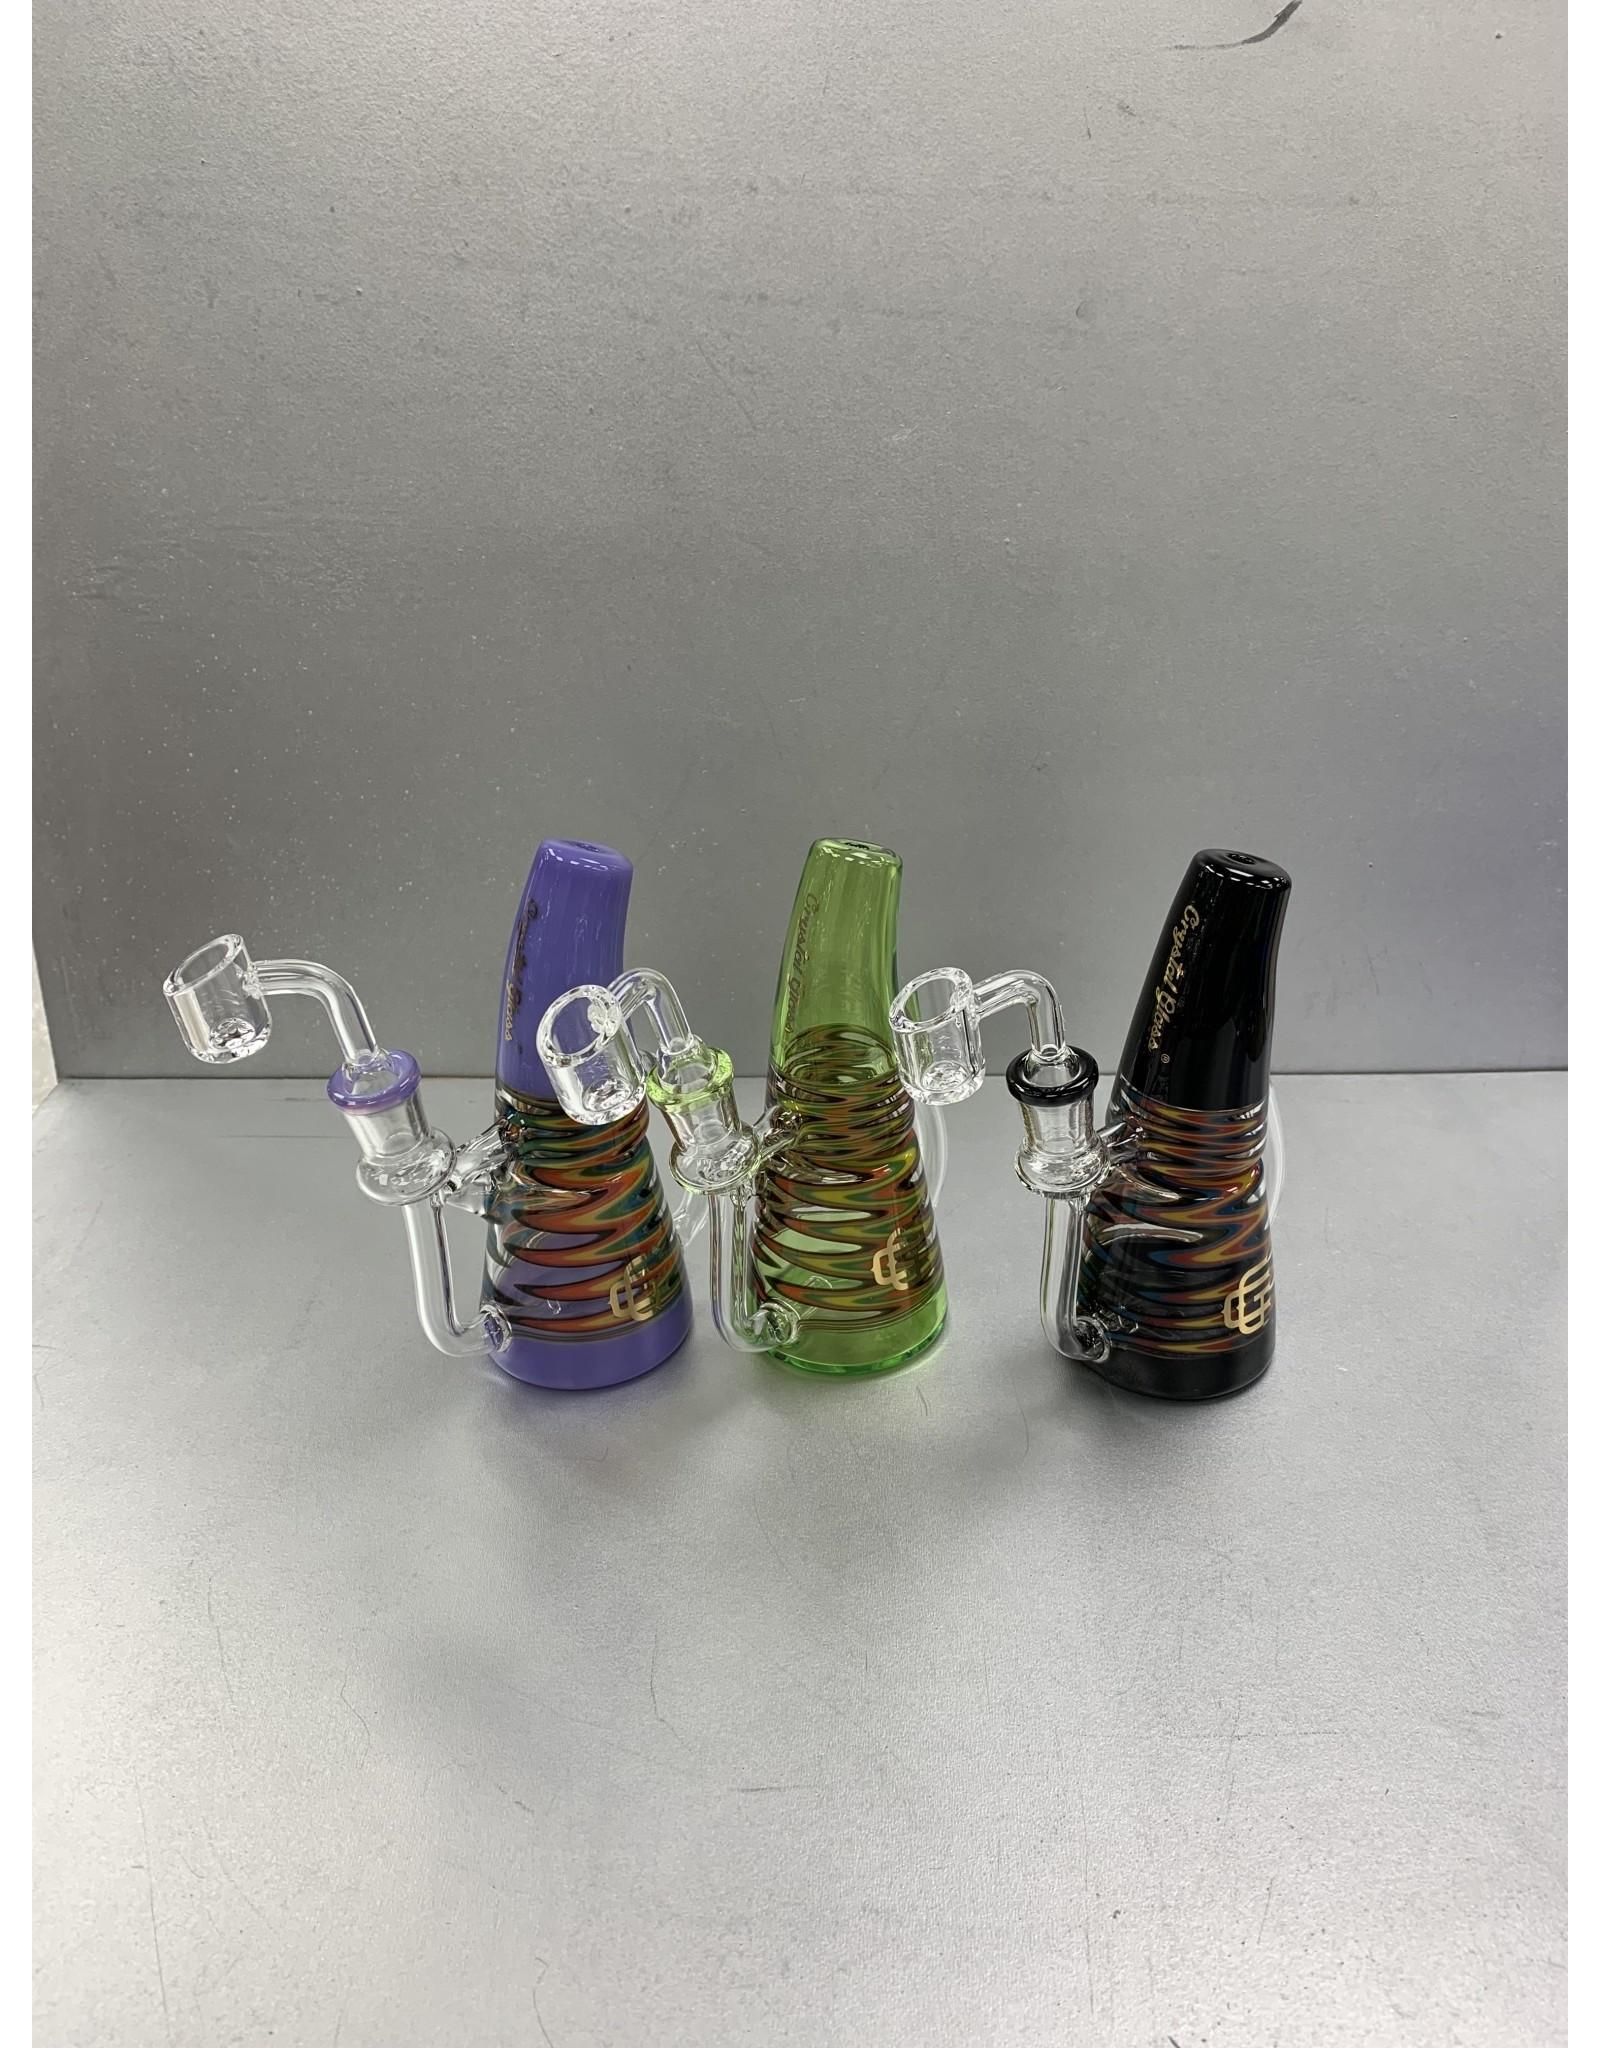 CRISTAL GLASS CRYSTAL GLASS 6.1 DAP RIG C6211